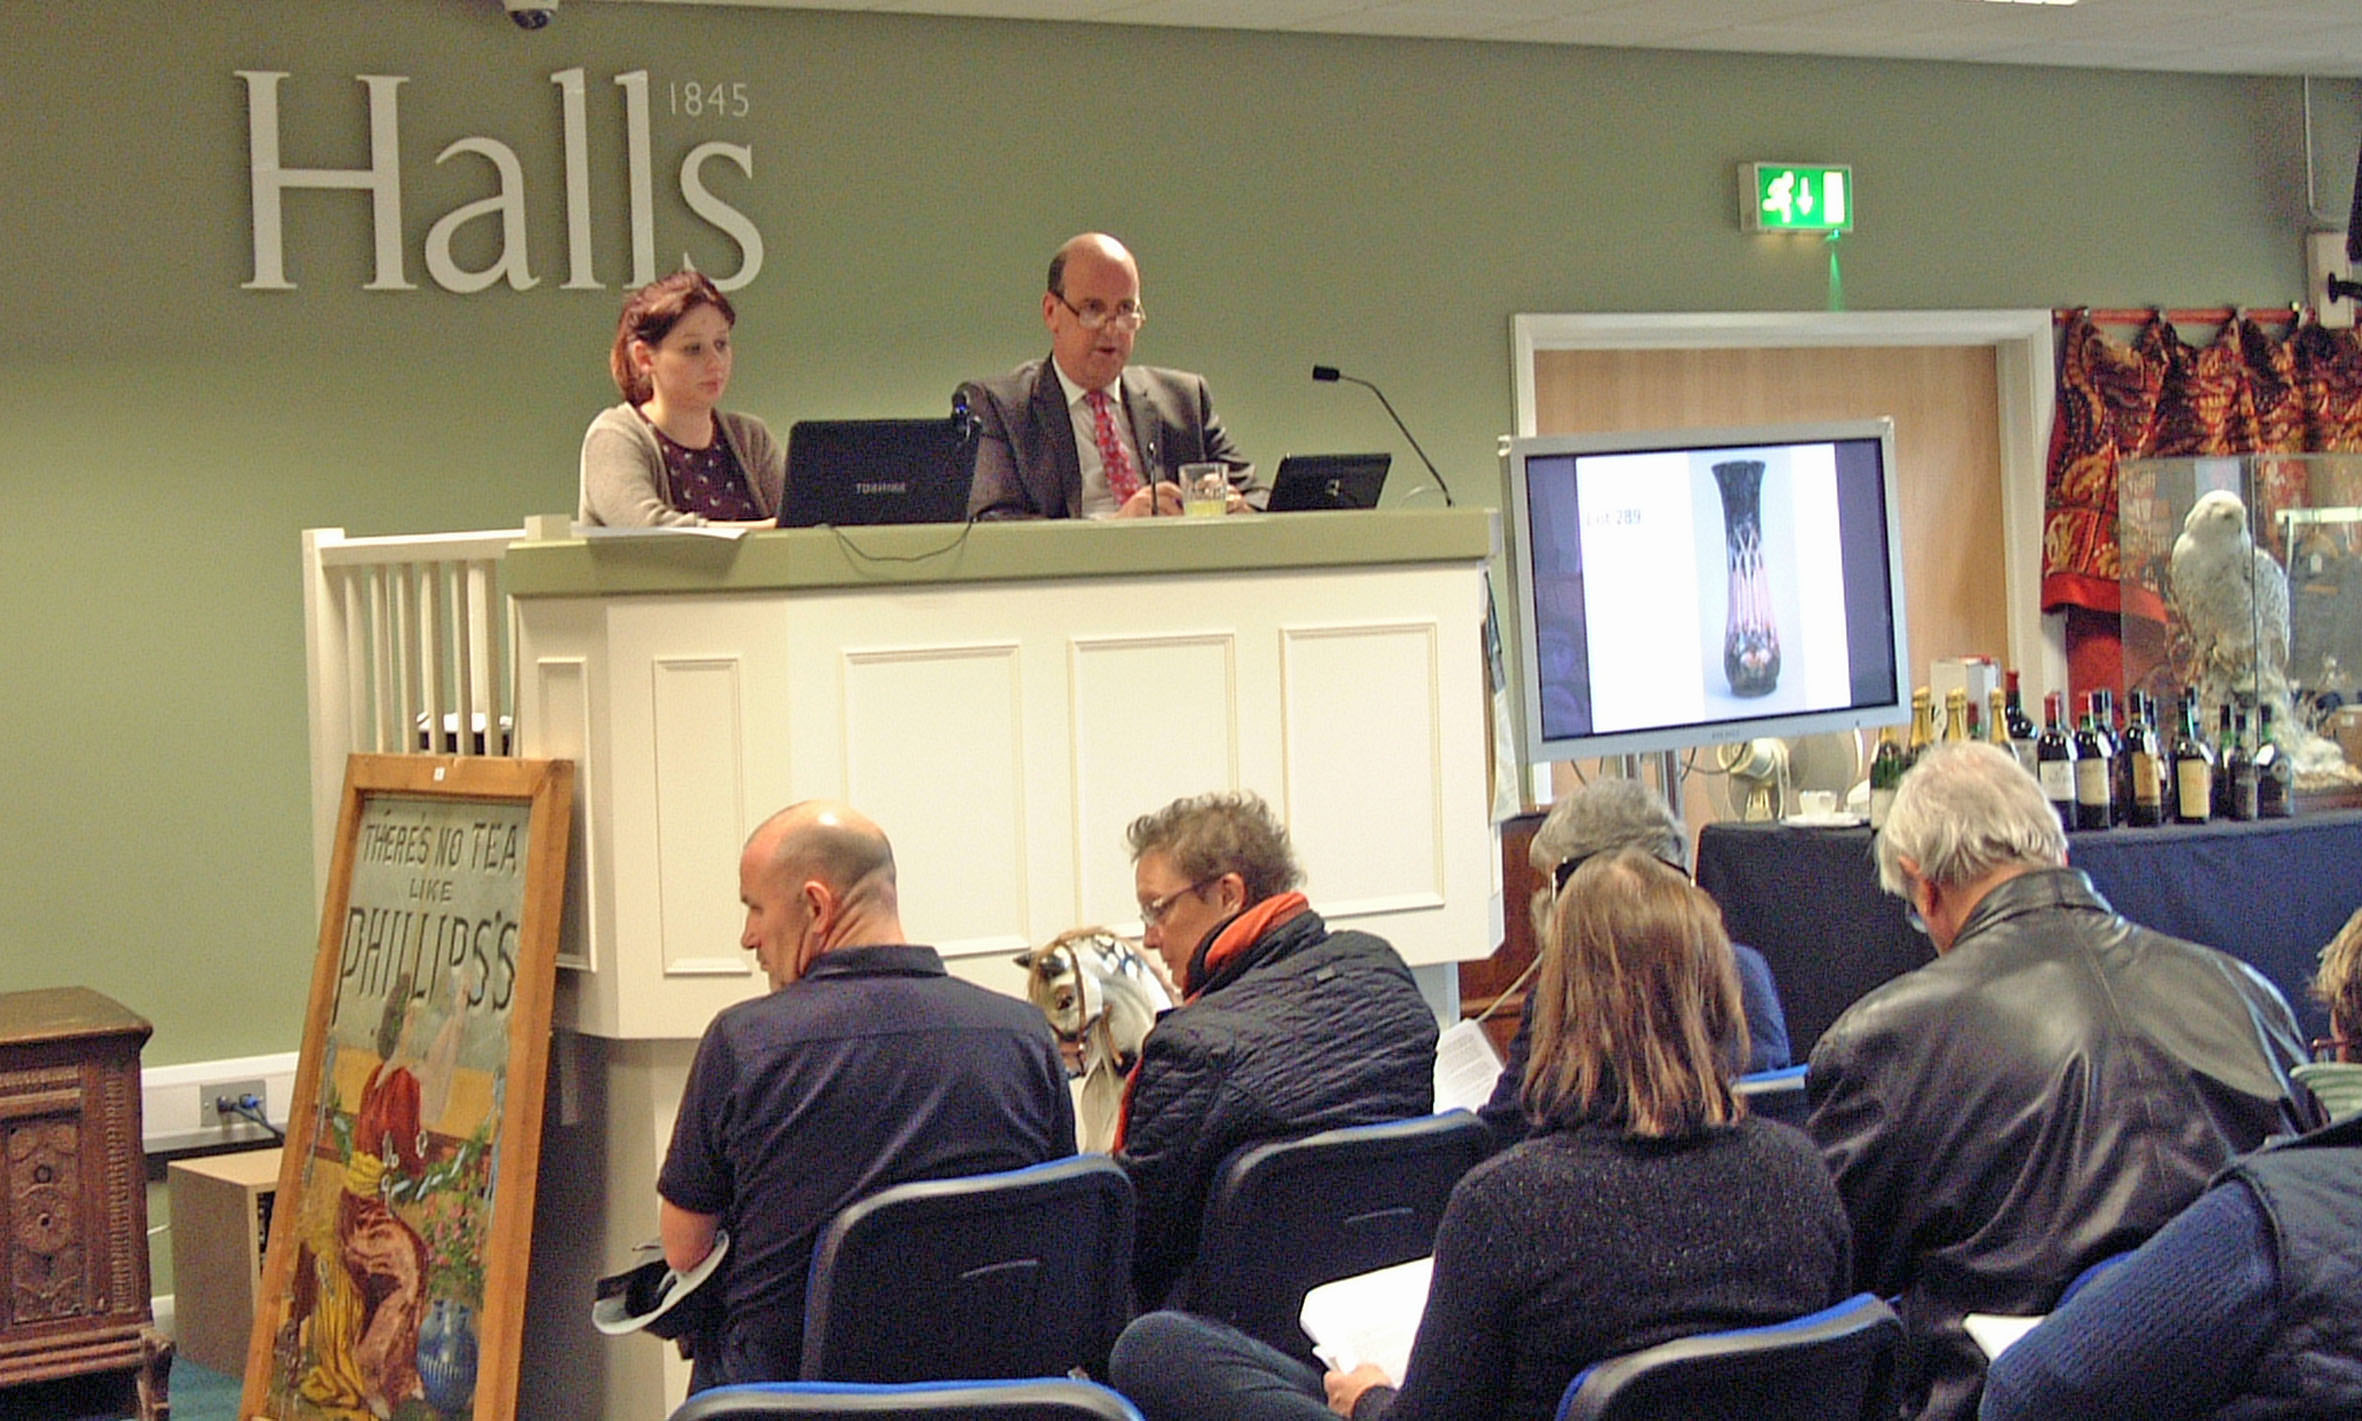 Halls auctioneers on the rostrum